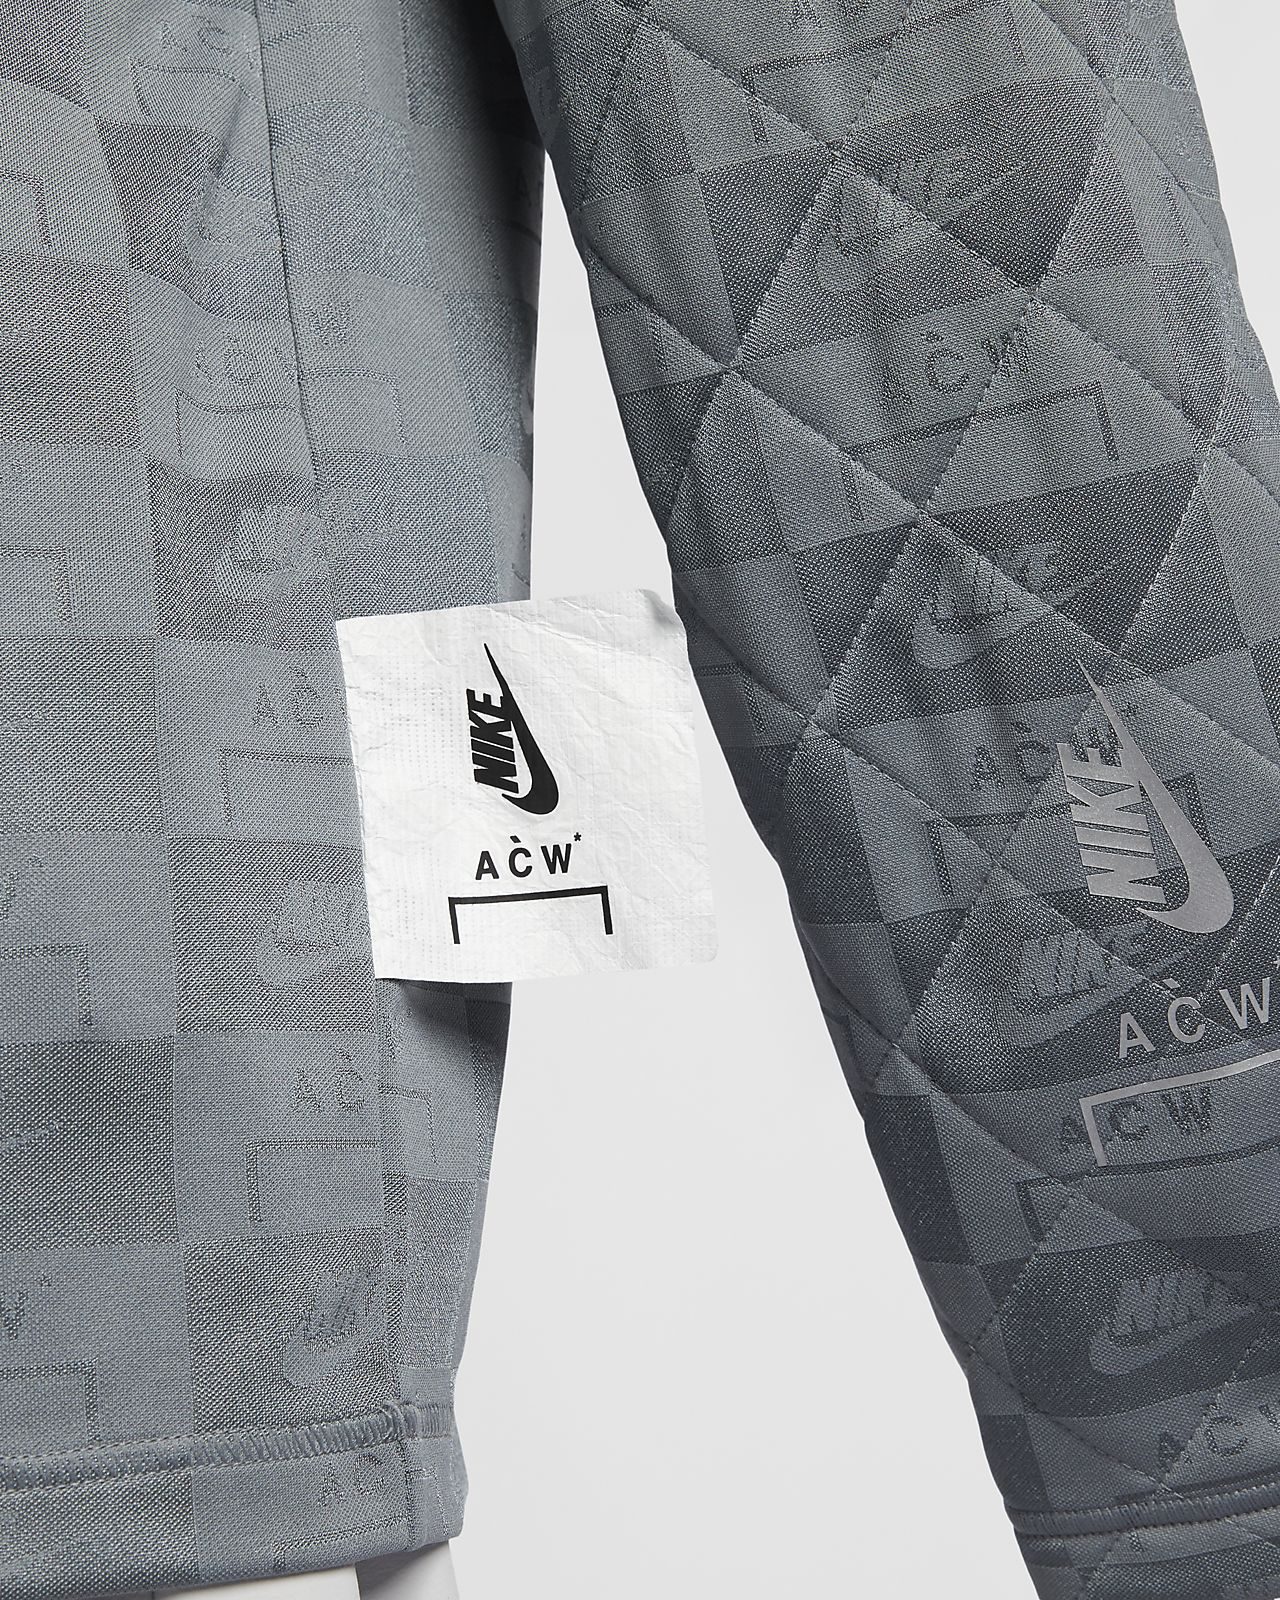 online retailer 1f32b 021d2 ... Męska koszulka z długim rękawem Nike x A-COLD-WALL